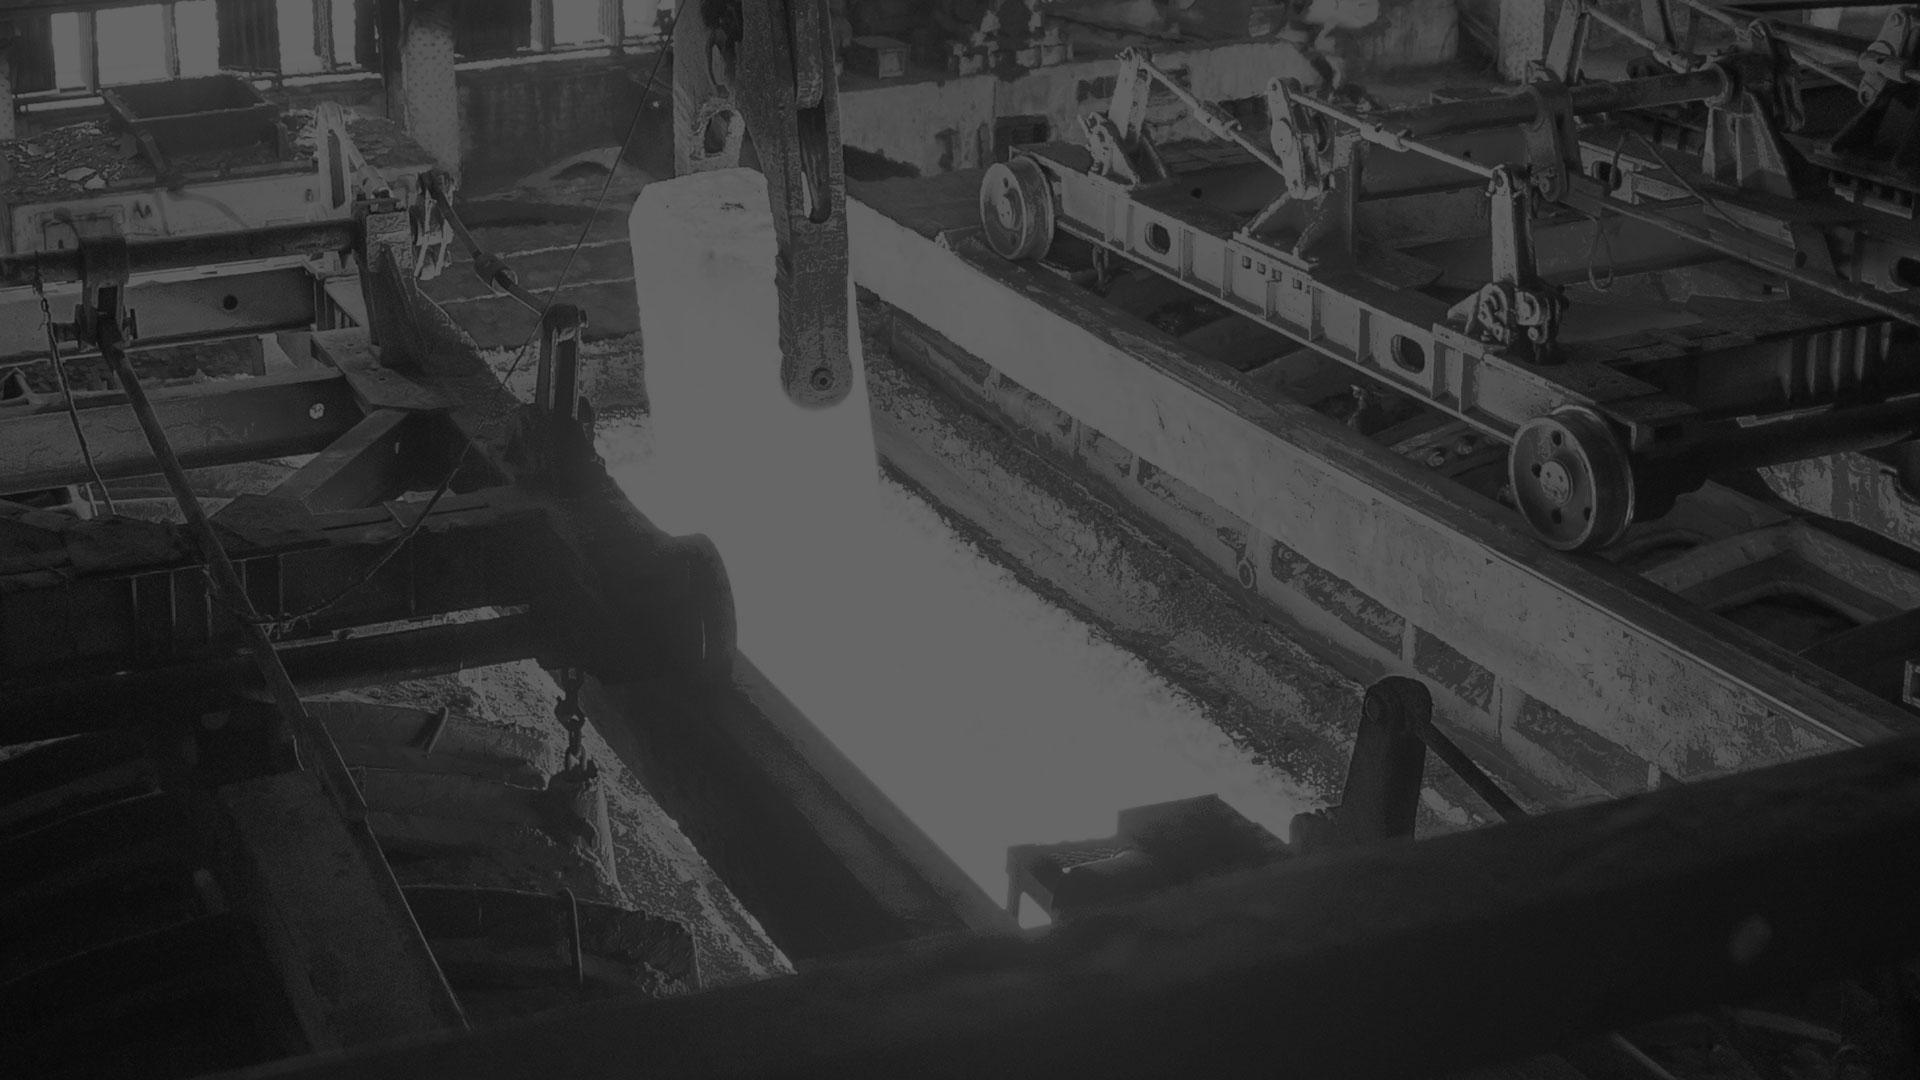 A darkened black and white image of a heat treat furnance.